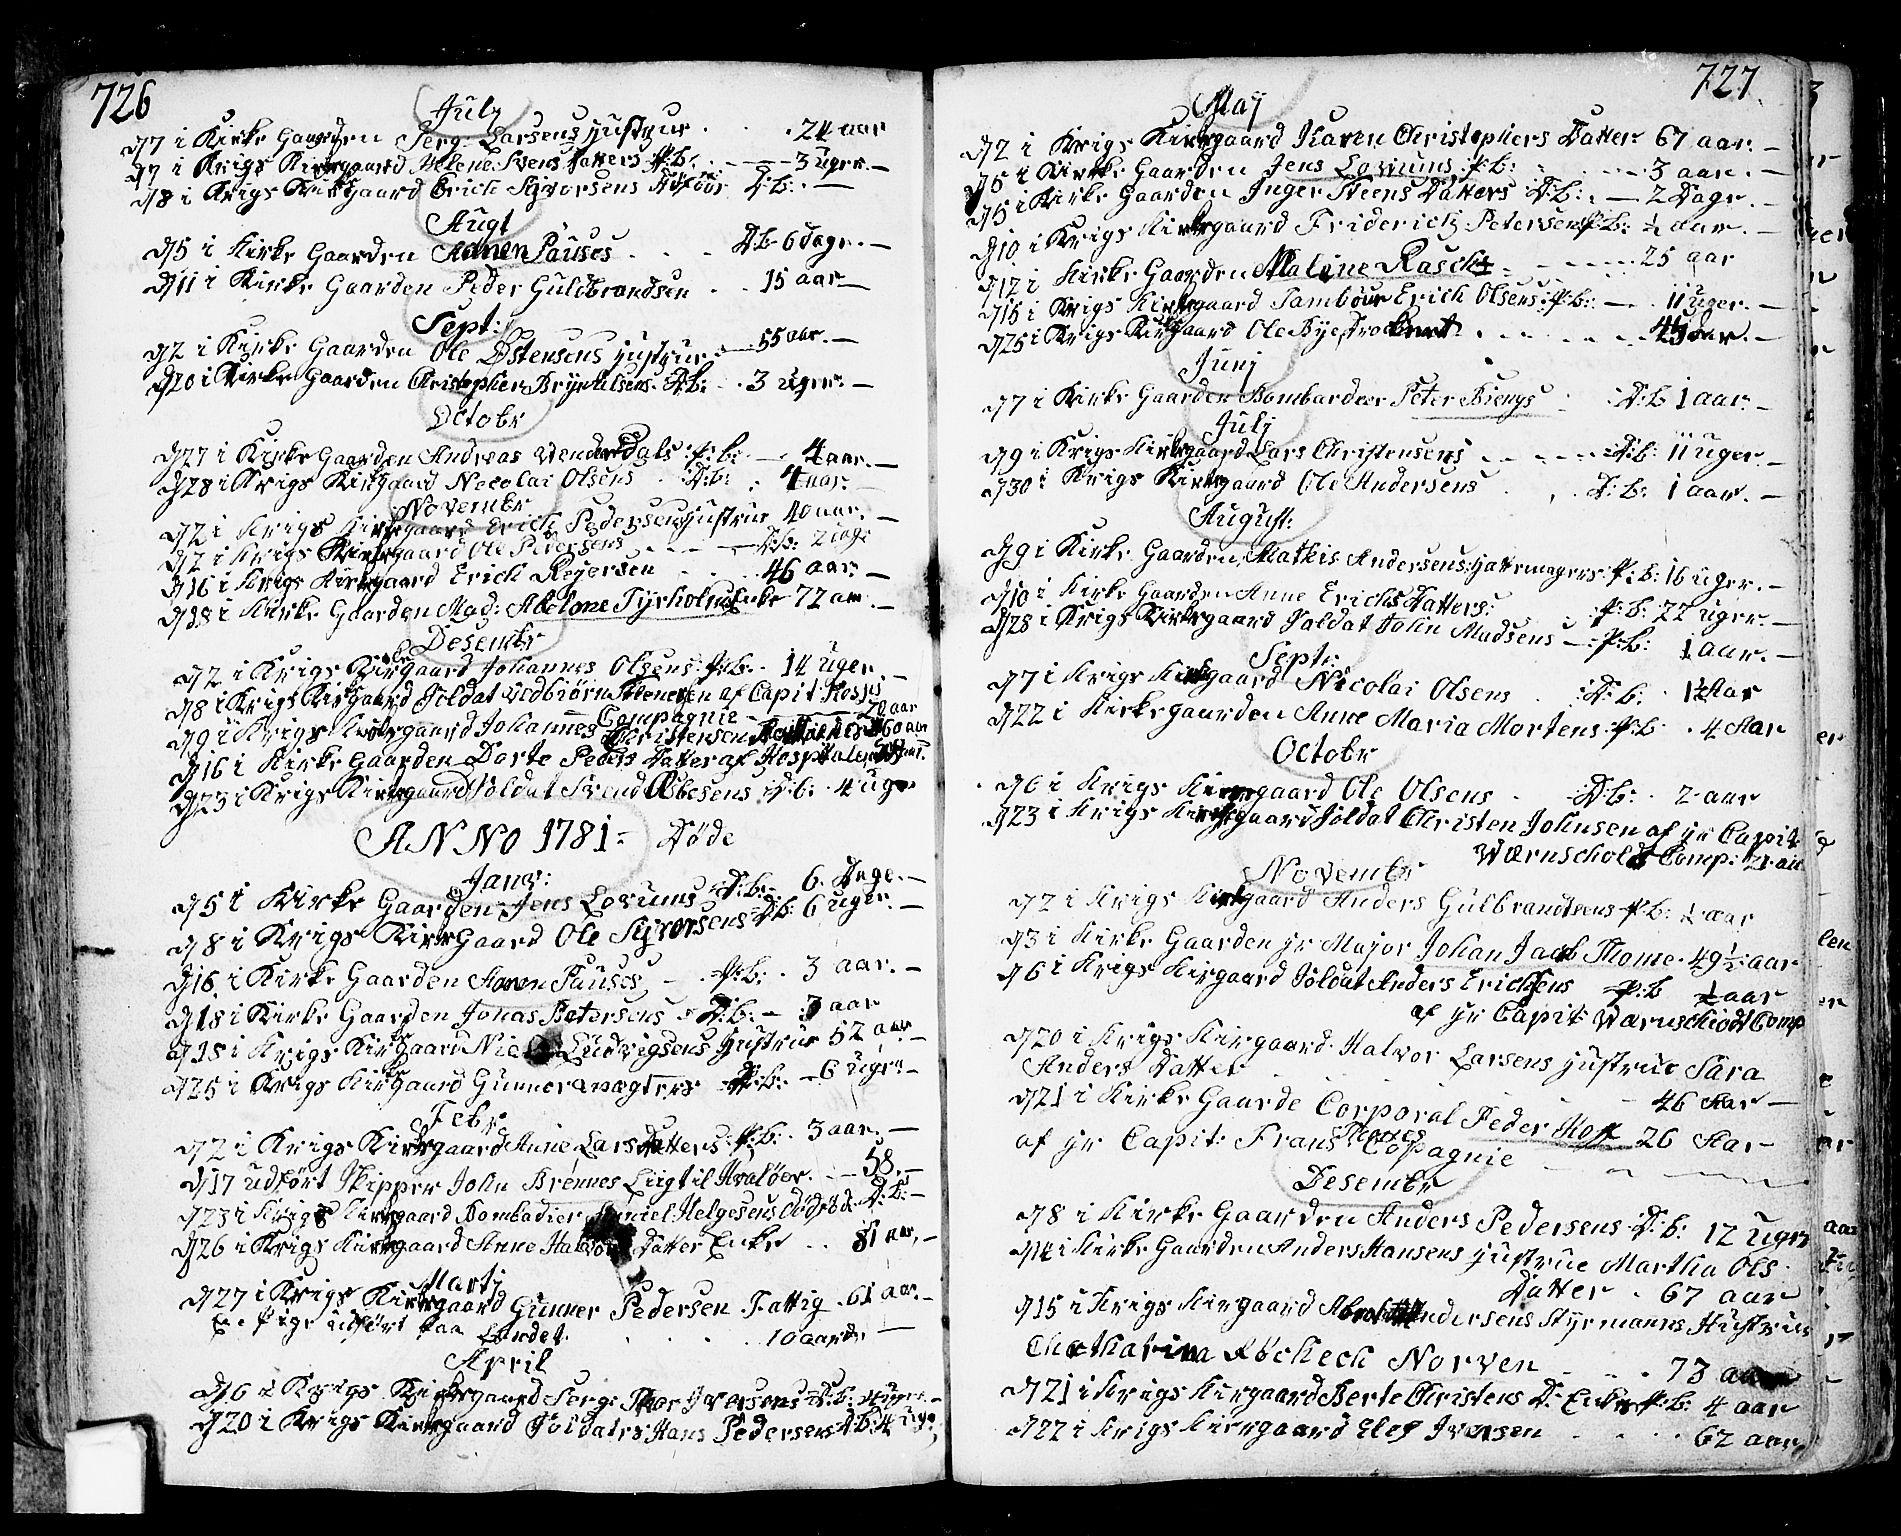 SAO, Fredrikstad prestekontor Kirkebøker, F/Fa/L0002: Ministerialbok nr. 2, 1750-1804, s. 726-727